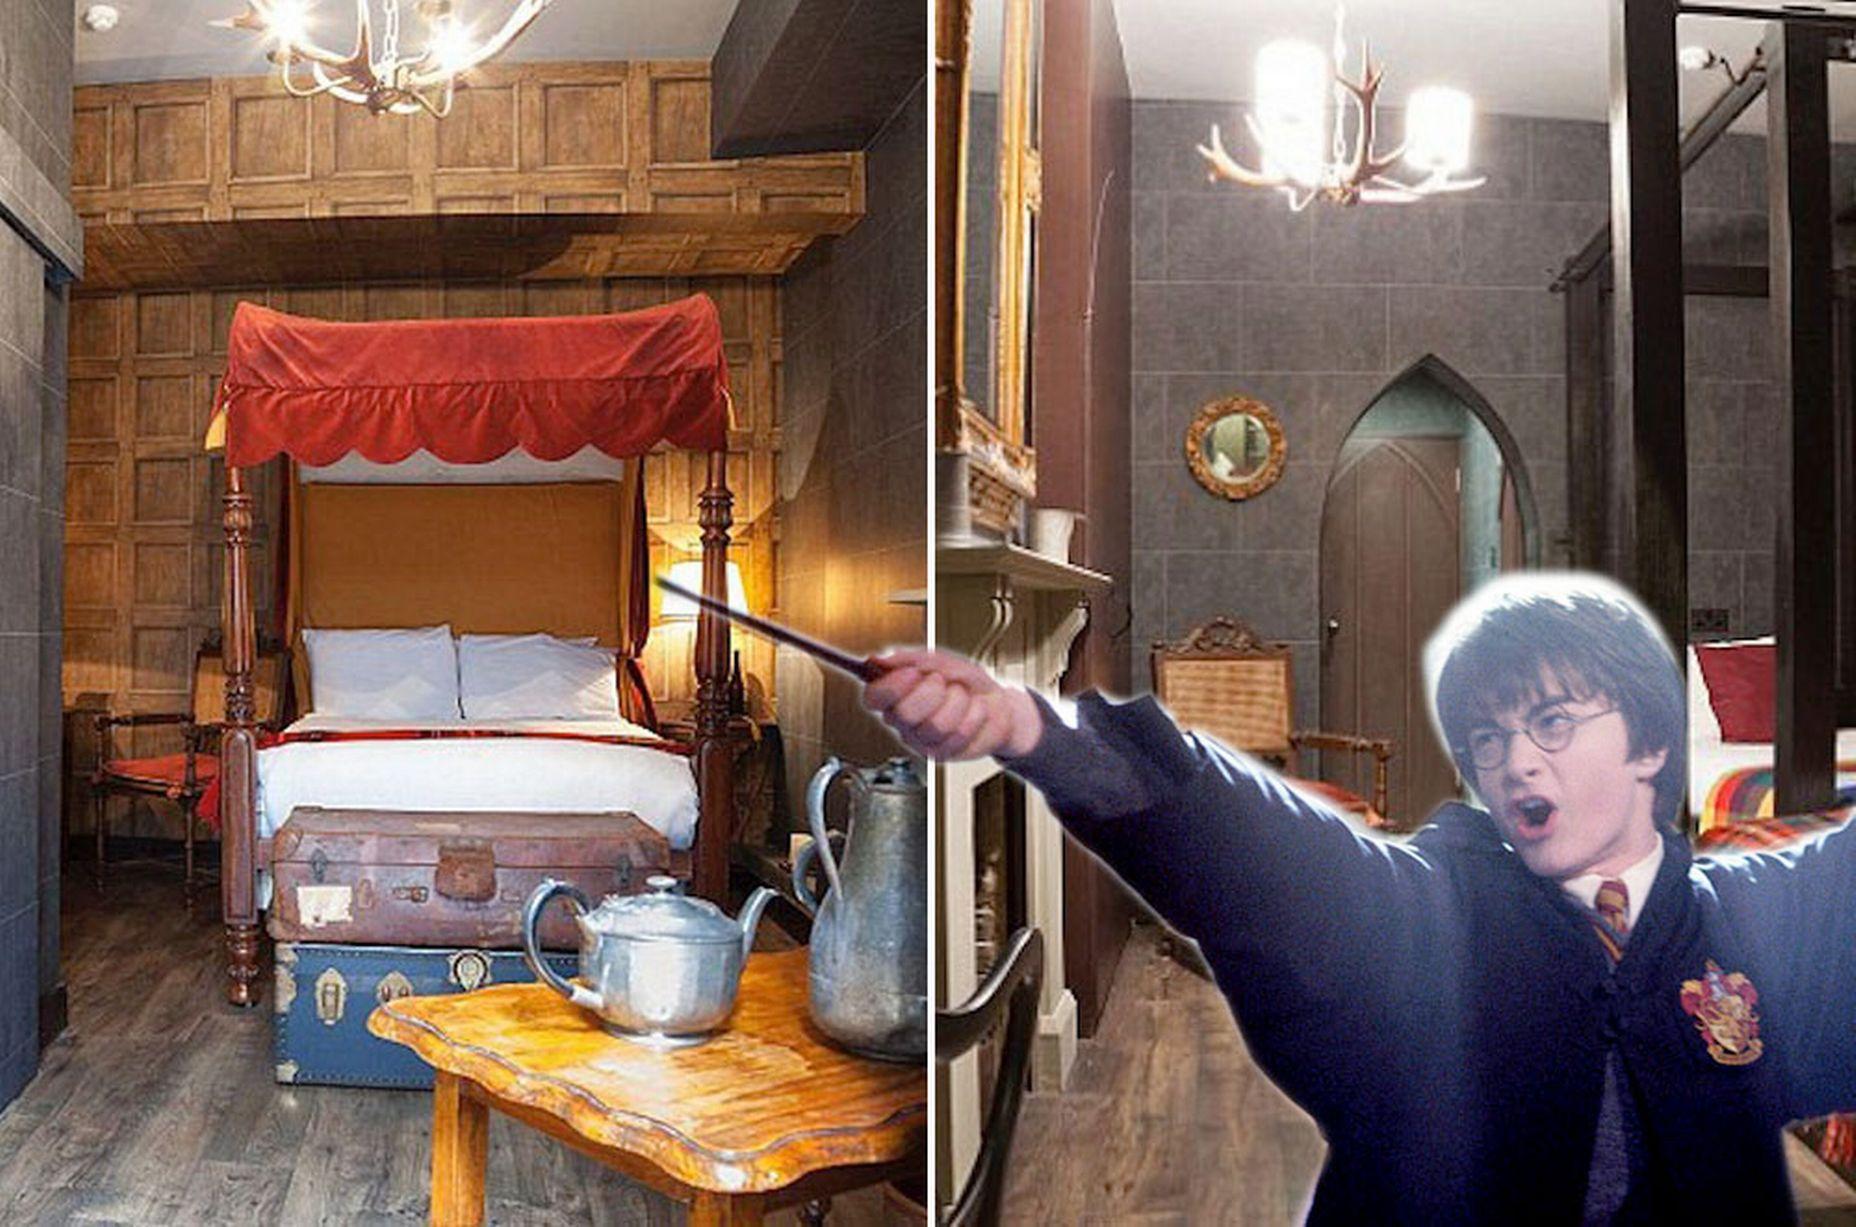 Harry Potter Themed Georgian House Hotel London Harry Potter Hotel Harry Potter Cursed Child Hogwarts Themed Room